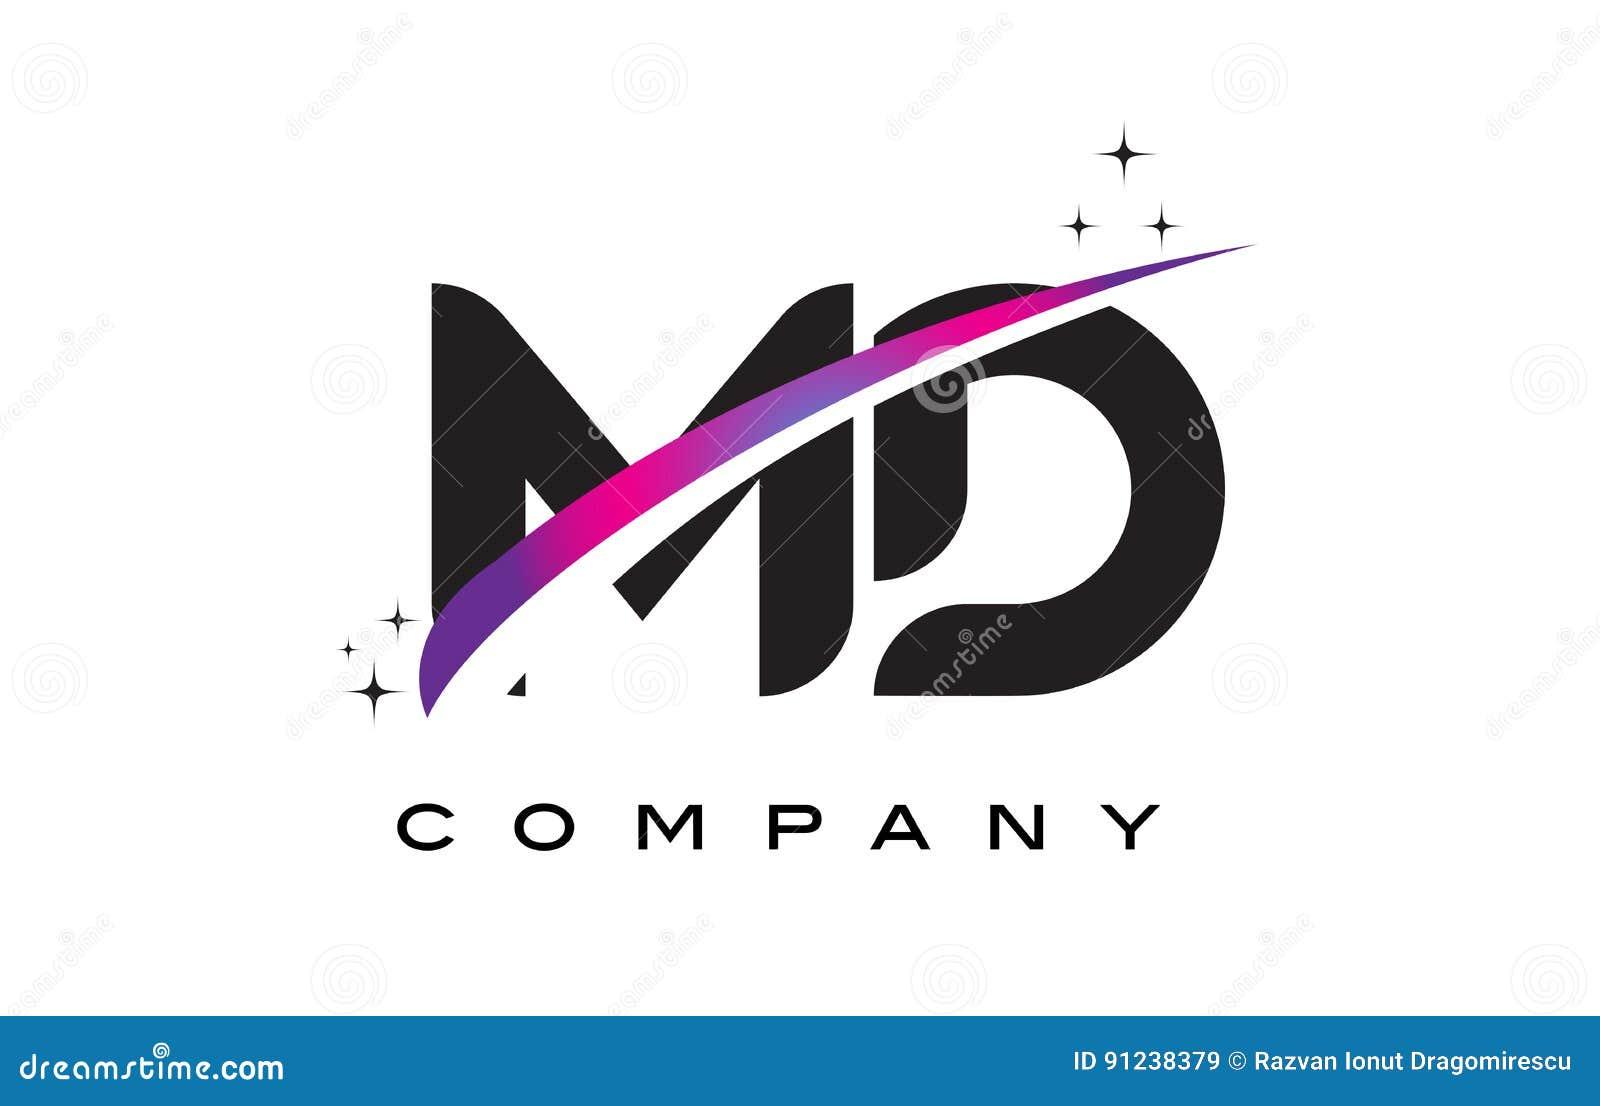 dm m d black letter logo design com swoosh magenta roxo ilustra o do vetor ilustra o de. Black Bedroom Furniture Sets. Home Design Ideas